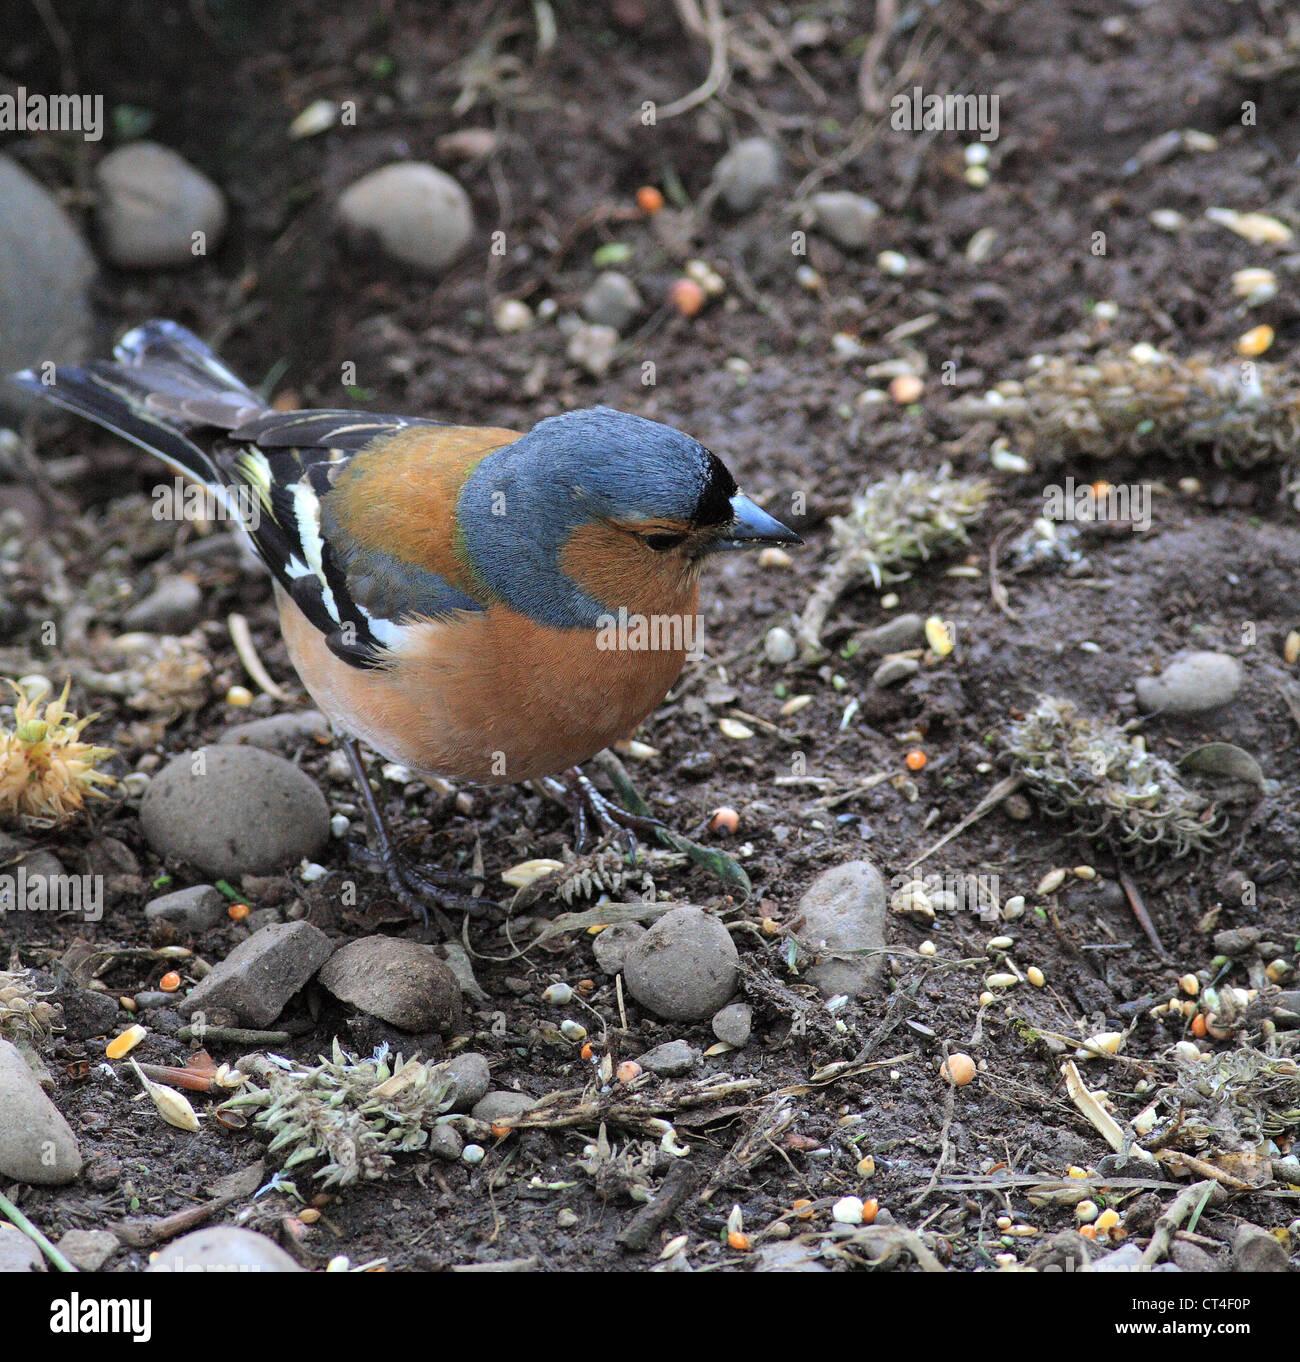 Male Chaffinch ( Fringilla coelebs ) in summer plummage feeding on the ground, UK - Stock Image